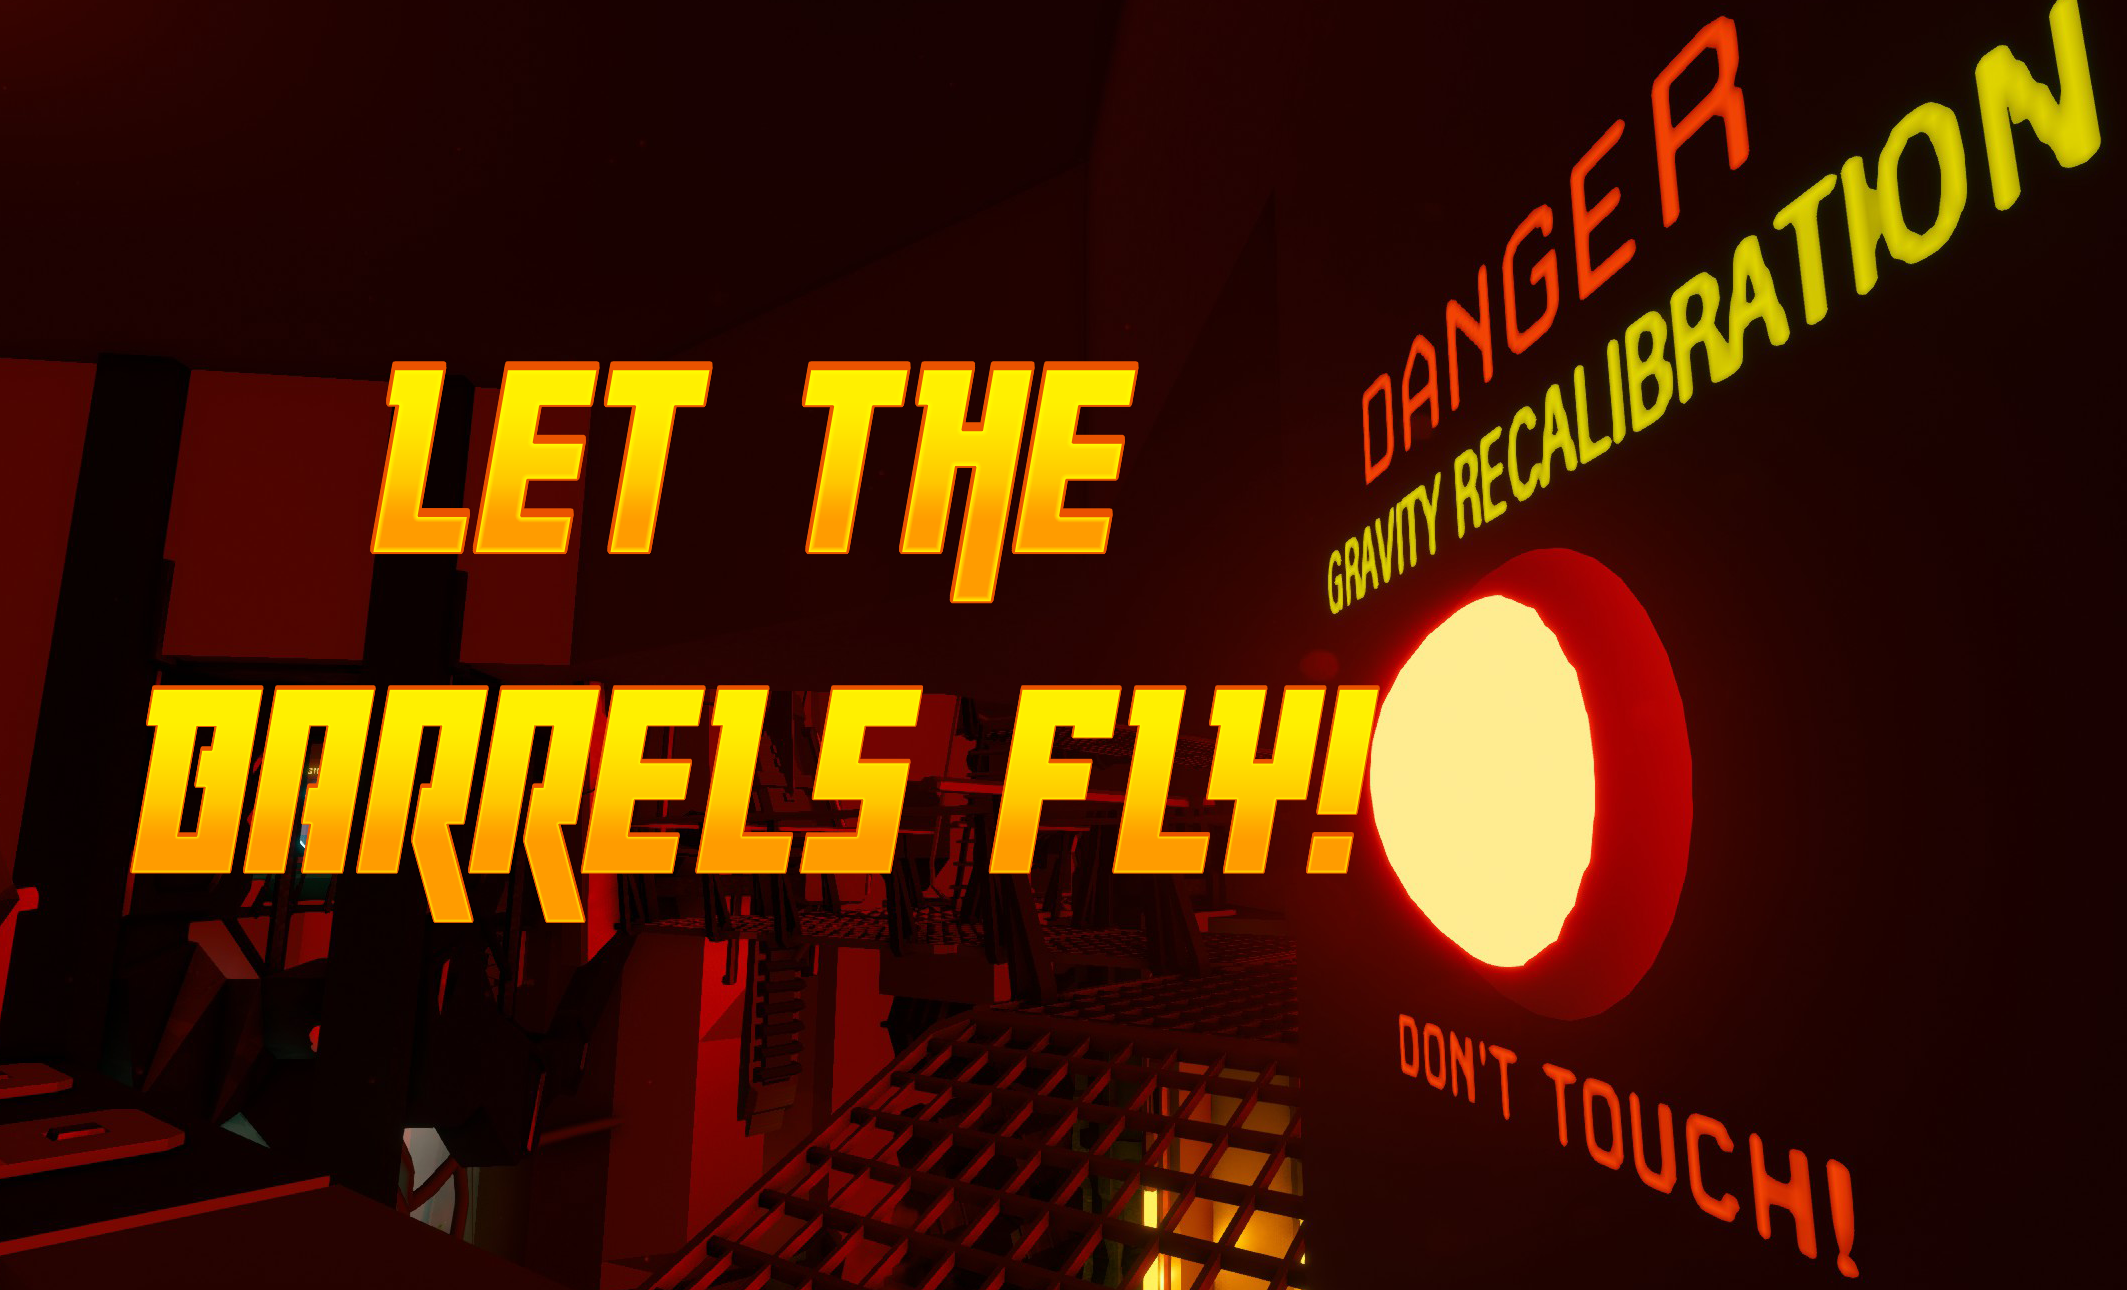 Let the barrels Fly.png